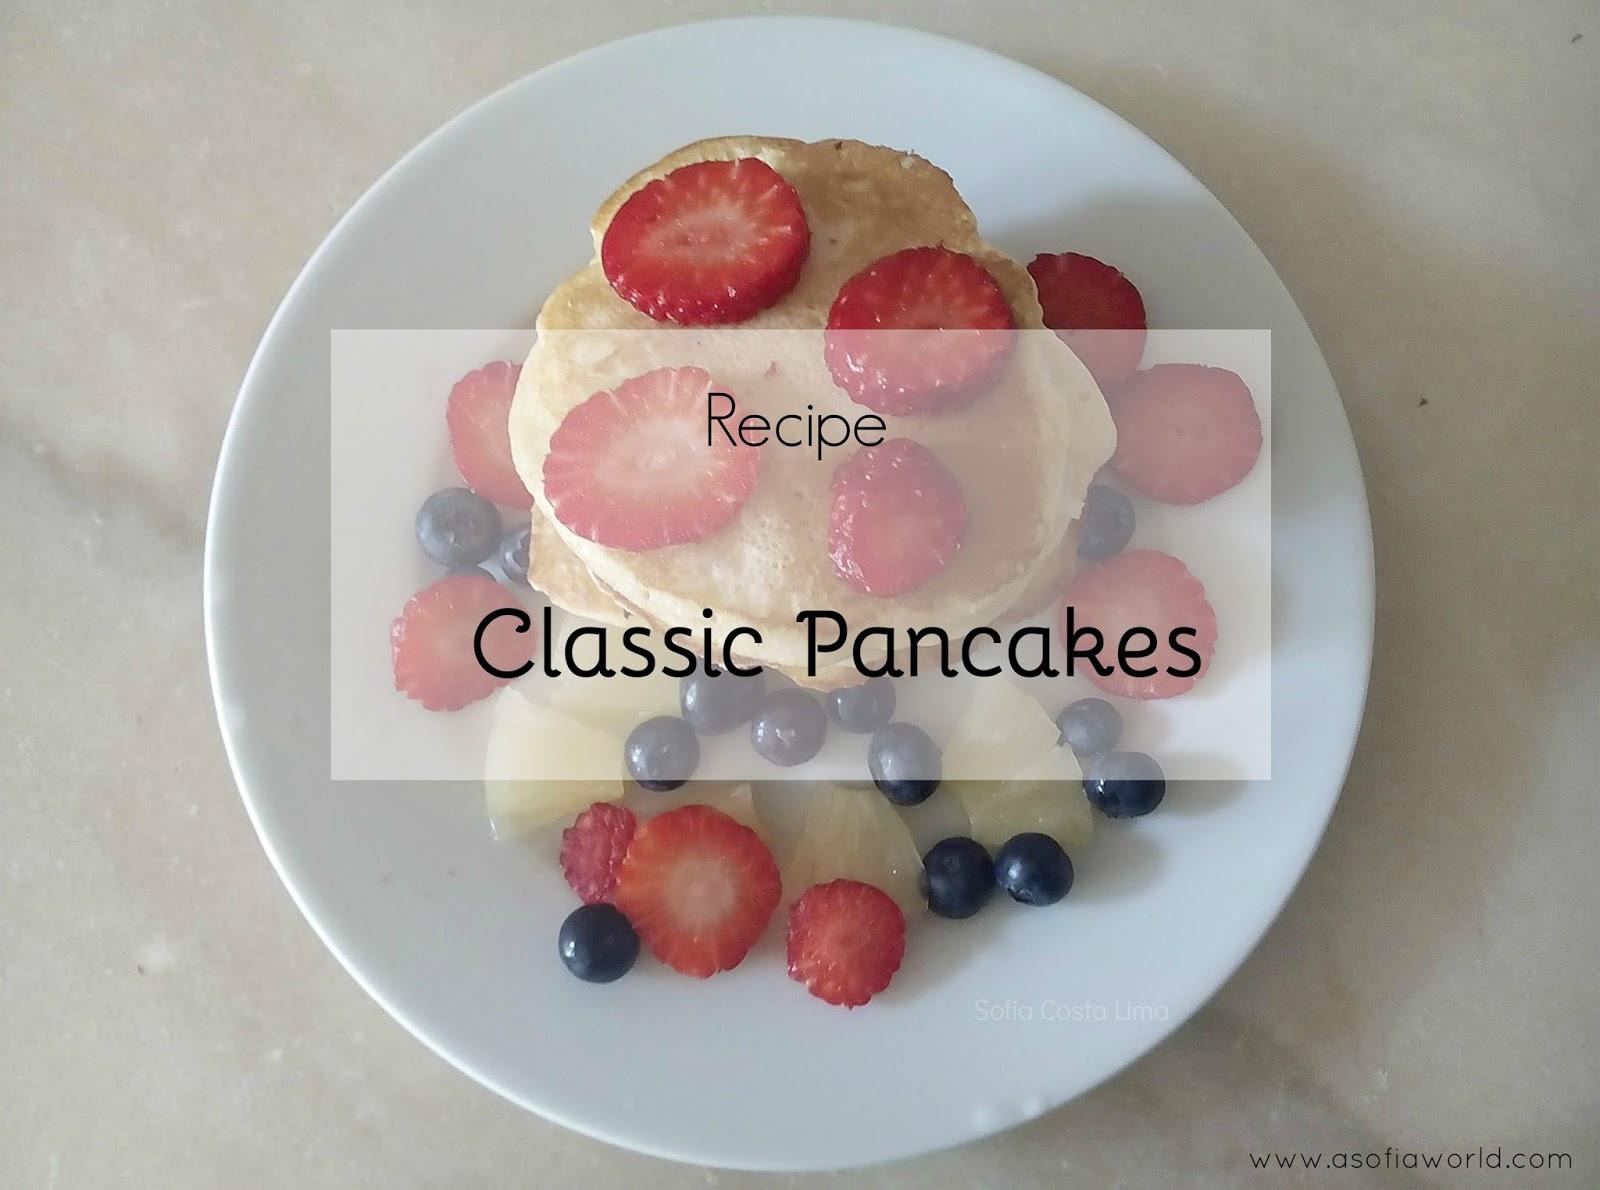 Recipe of classic american pancakes